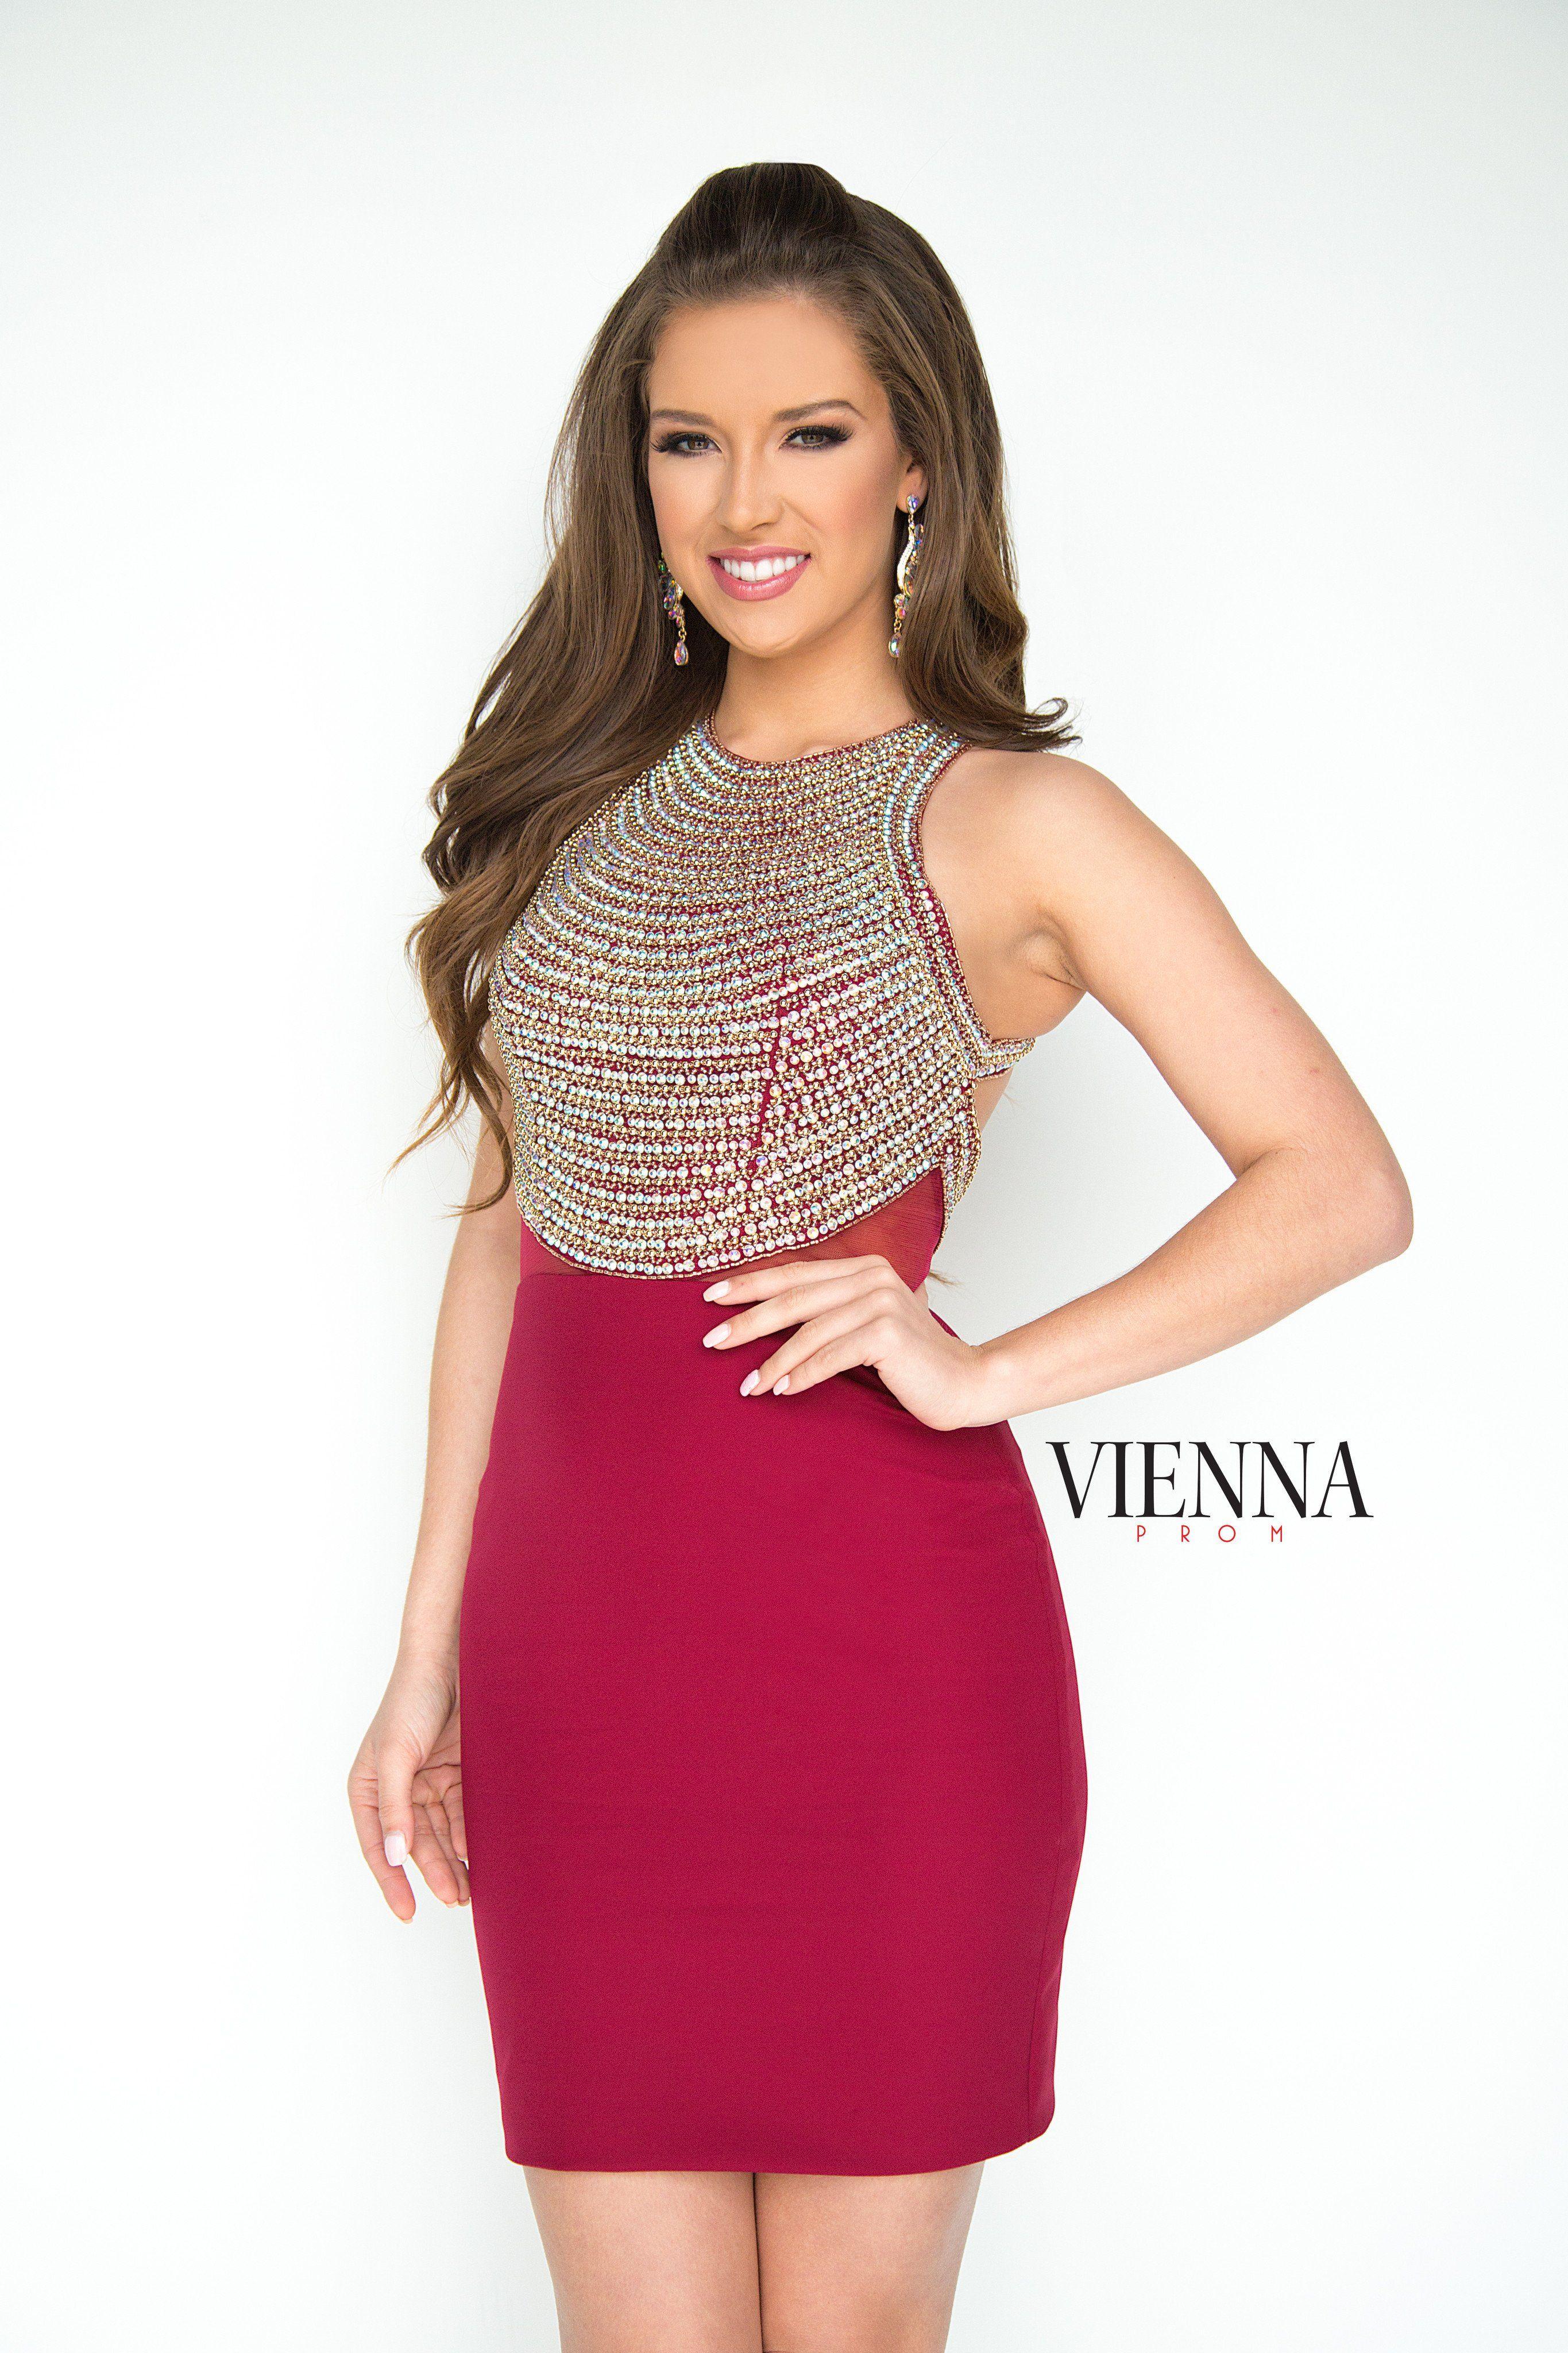 Vienna prom burgundy beaded high neck form fitting short dress